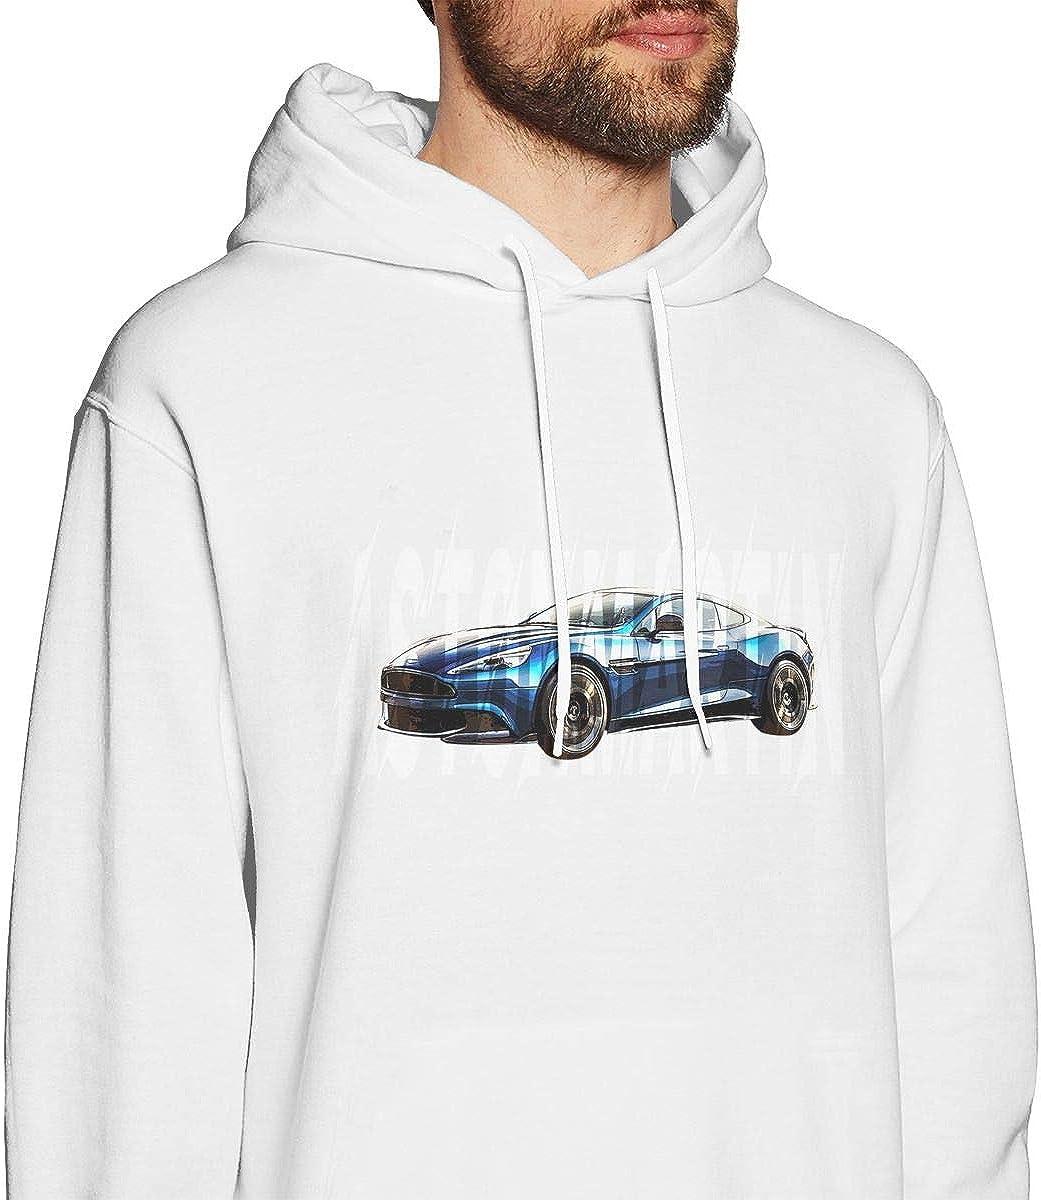 Wild Decisive Car Win Mens Hoodie Sweatshirt Pullover Long Sleeve Lightweight Drawstring Classic Personality